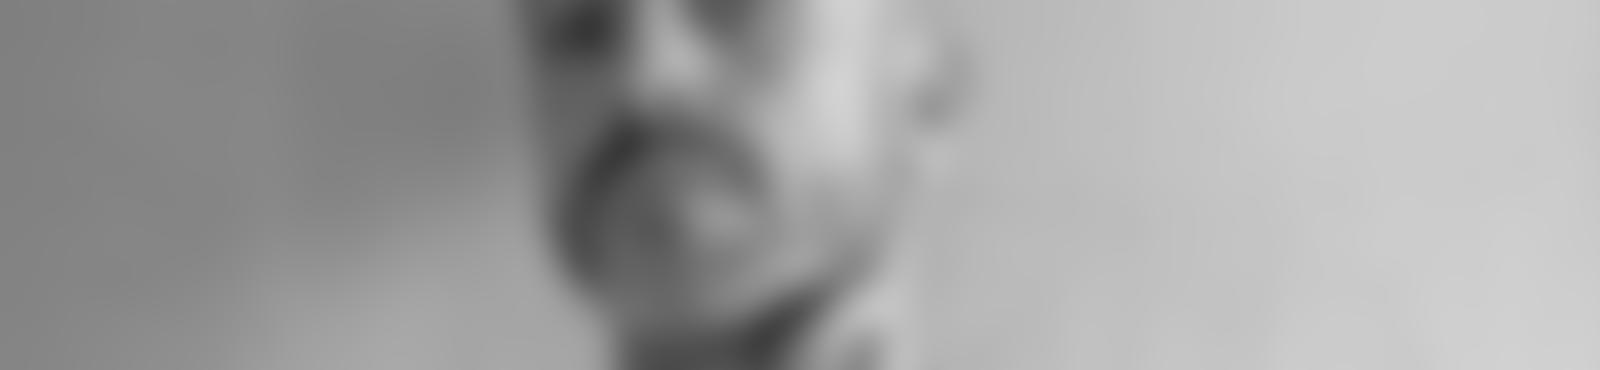 Blurred 4028f01b af07 4499 b748 c27ca013f1c9